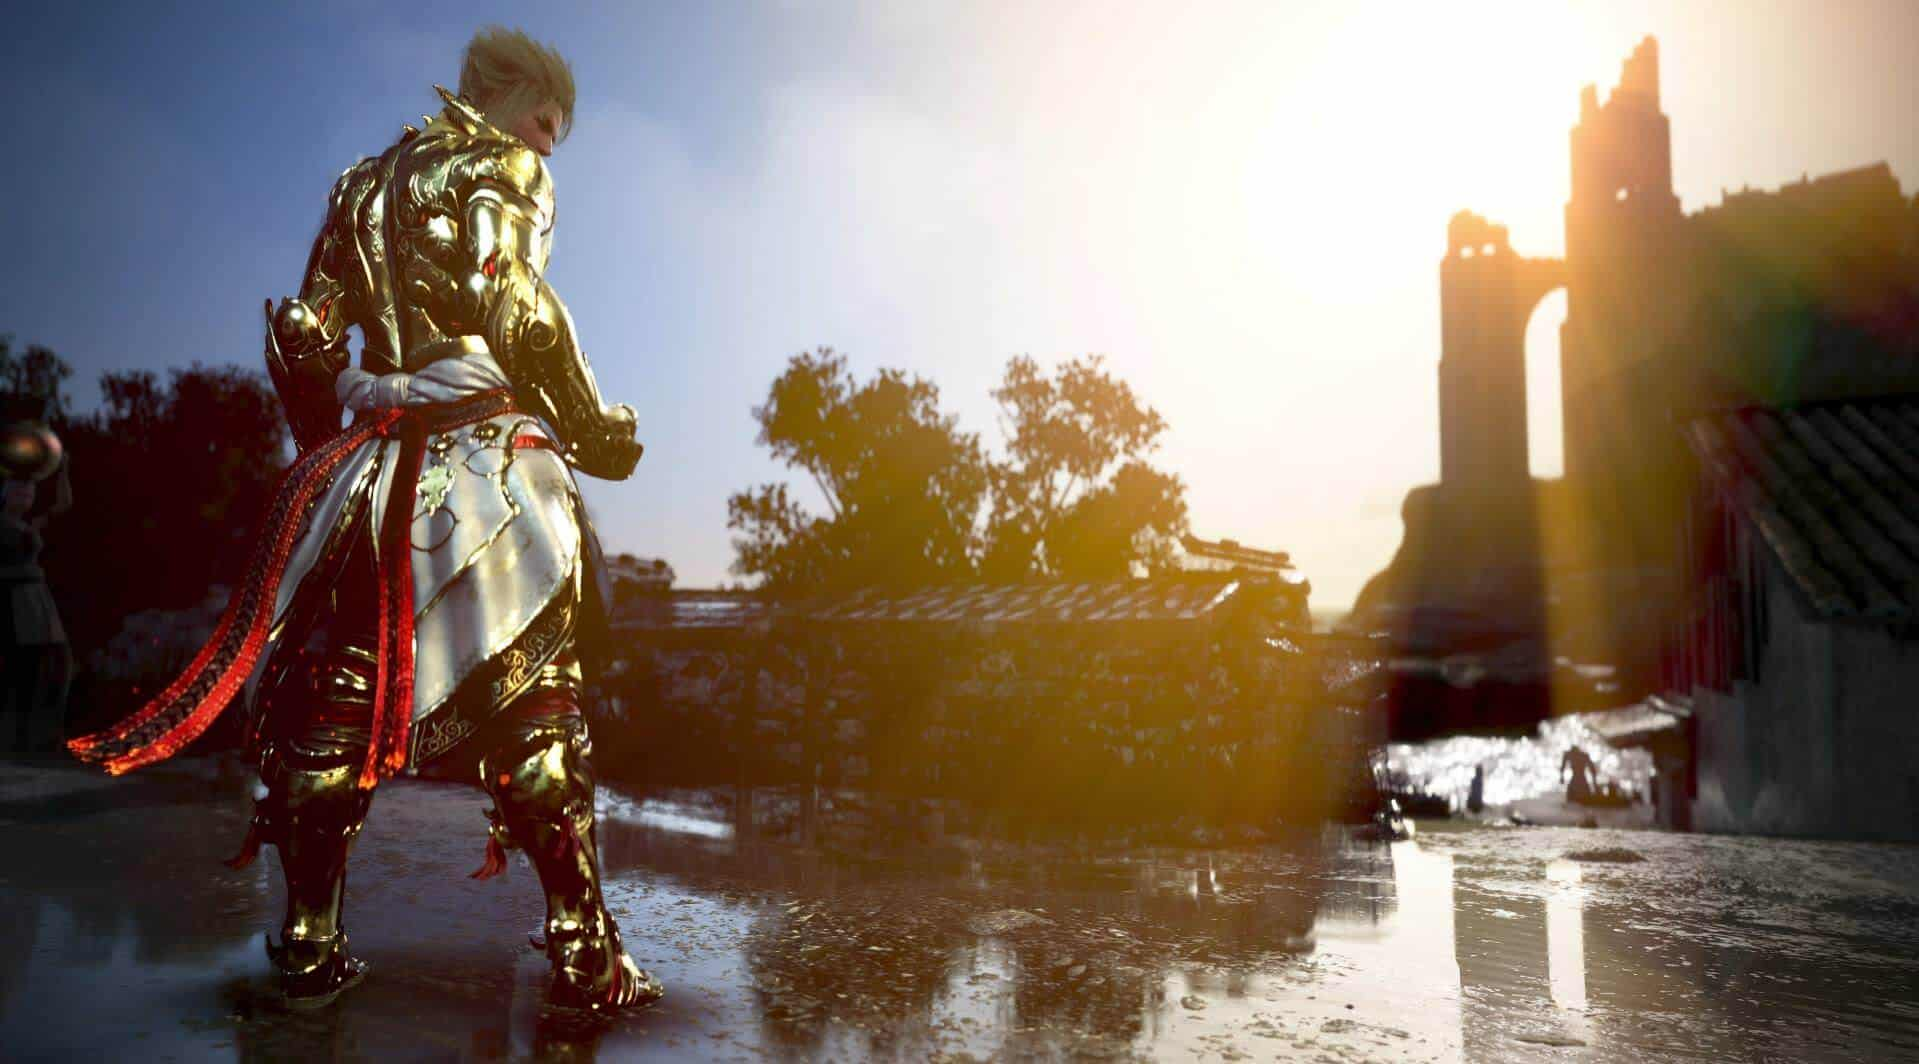 Black Desert Online 2018 Remaster 2 - Annunciato Black Desert Online Remaster, grafica aggiornata e prime immagini